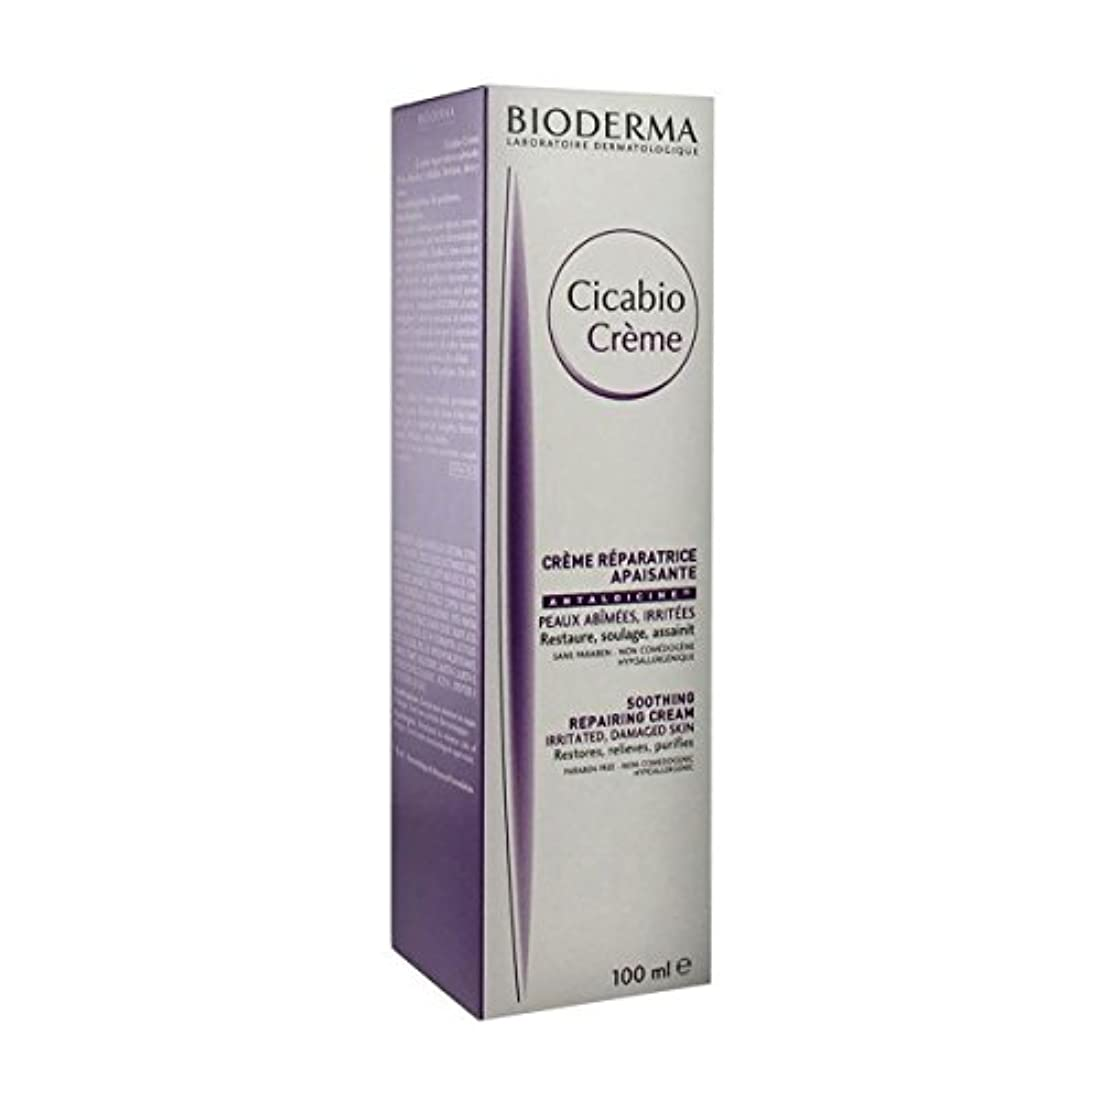 シュート濃度船形Bioderma Cicabio Cream 100ml [並行輸入品]